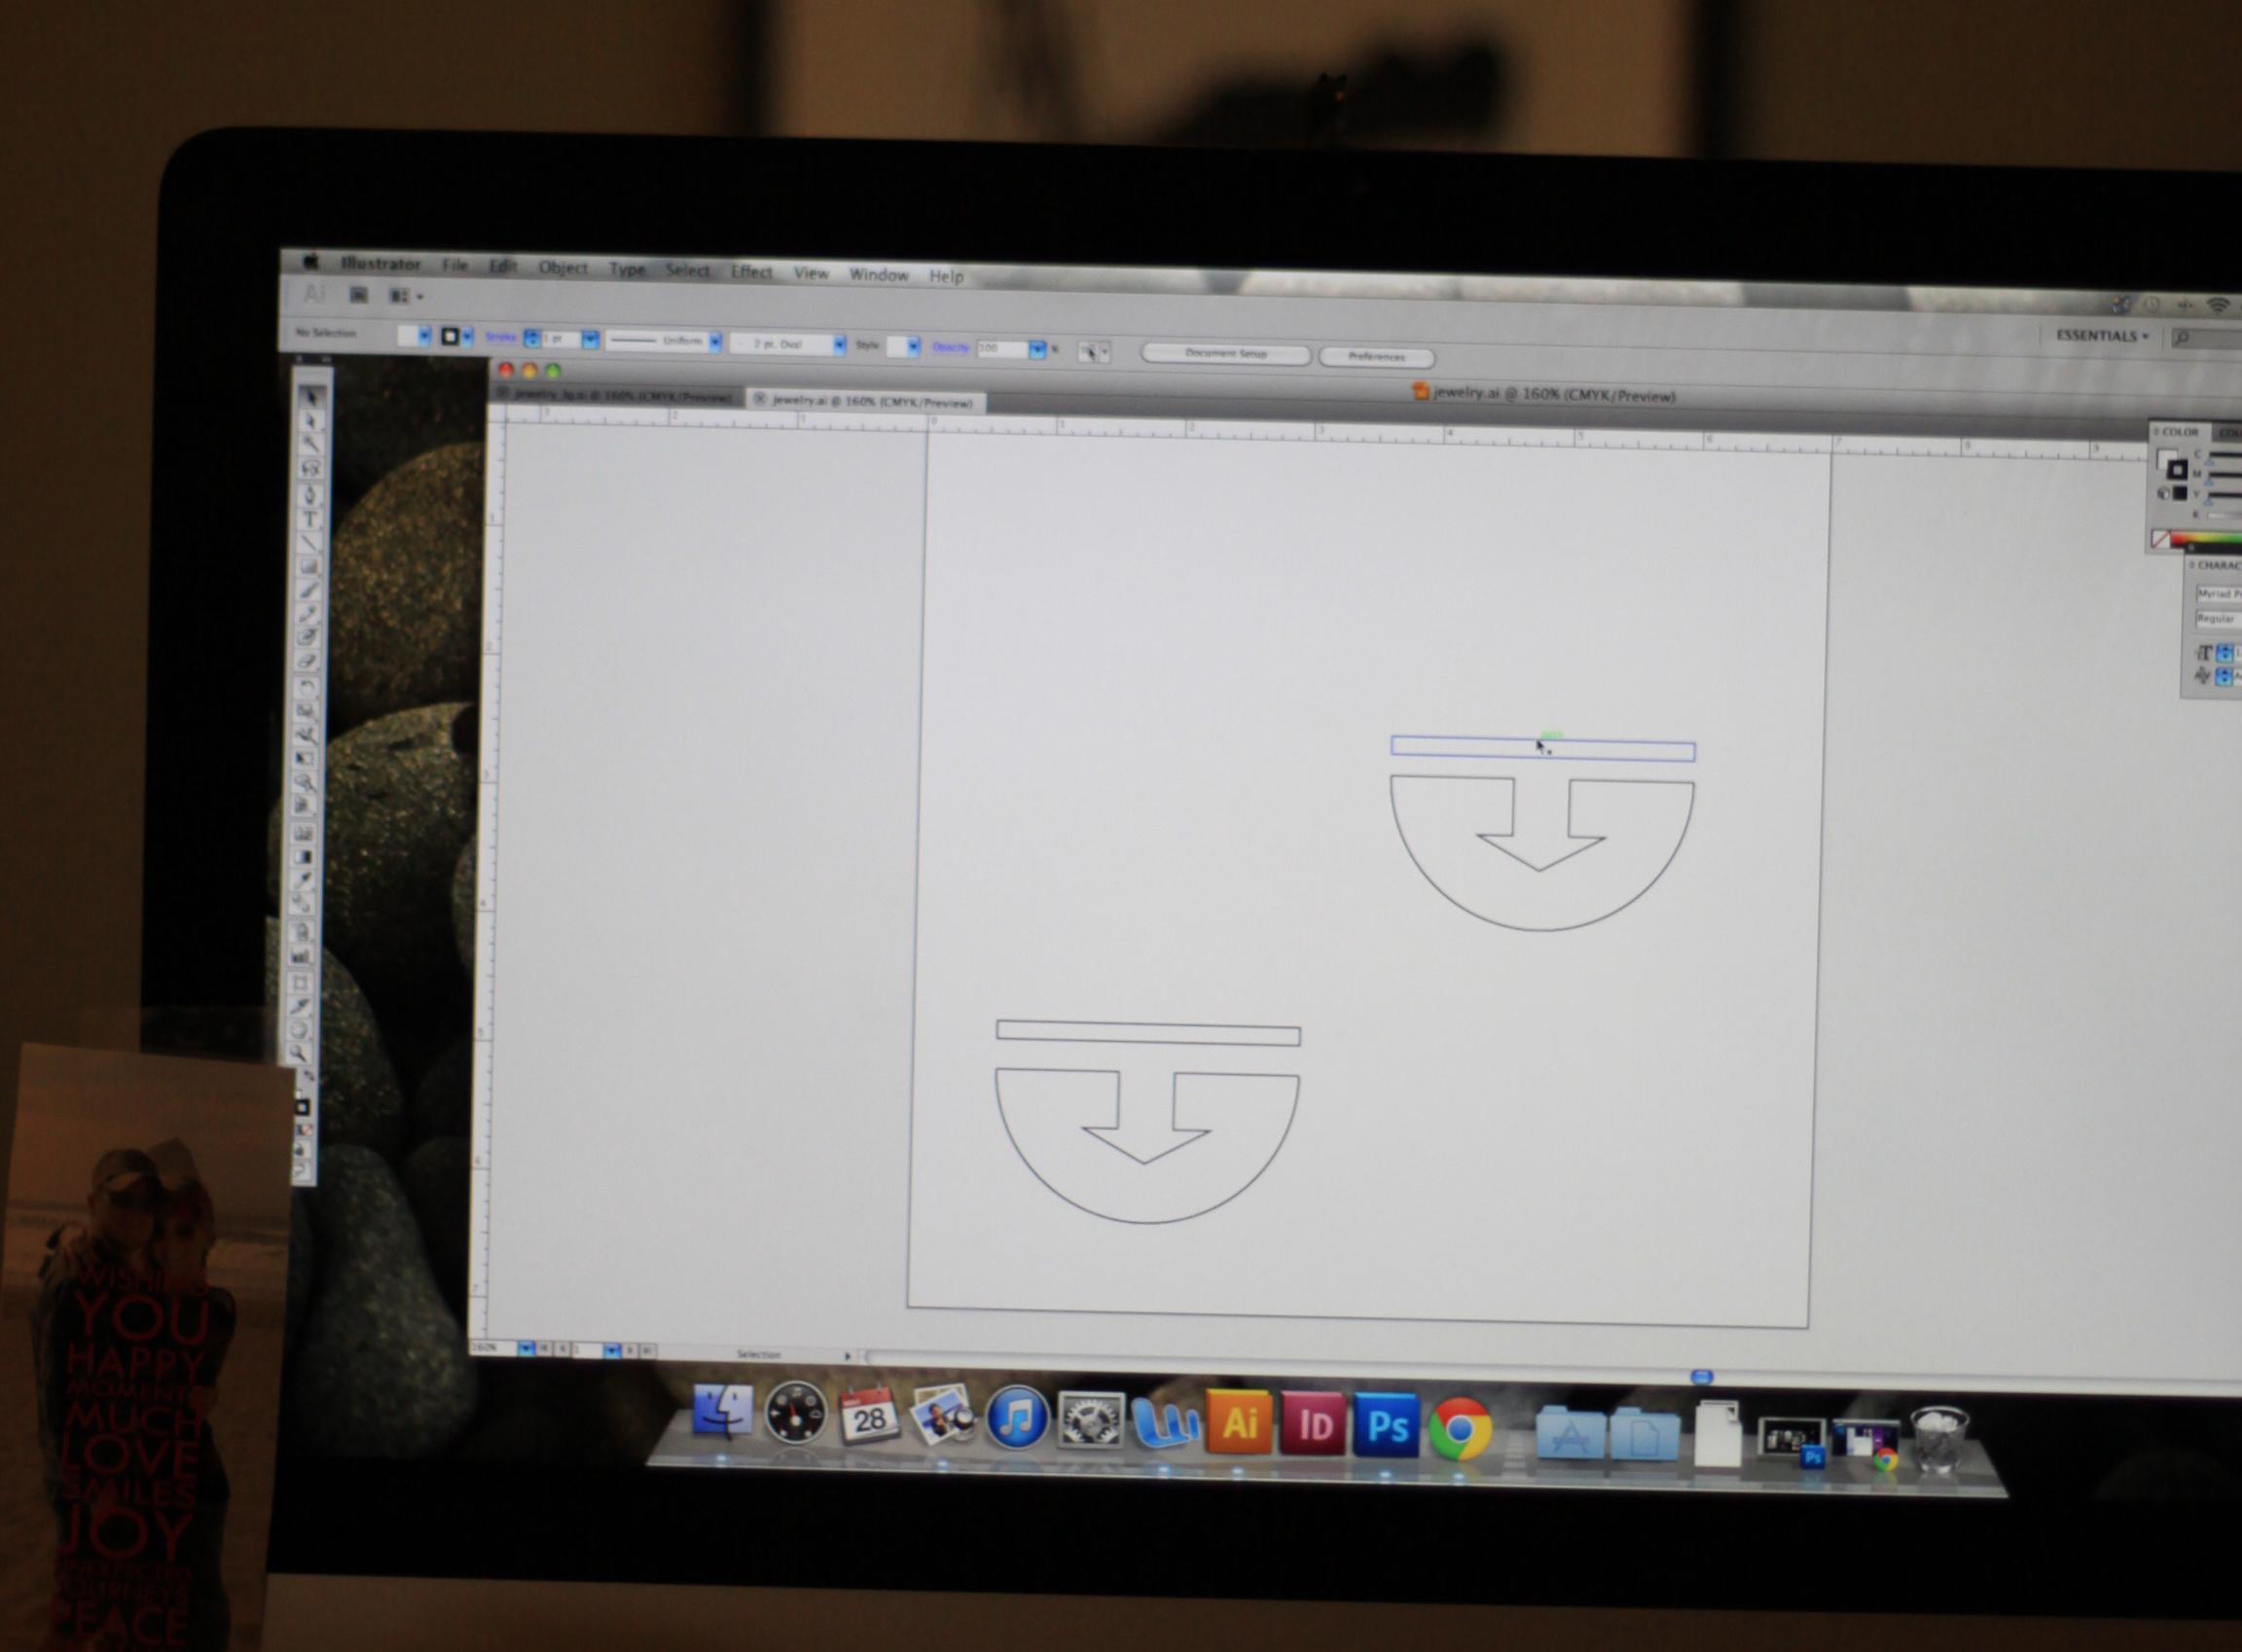 2. Digitization of Sketch